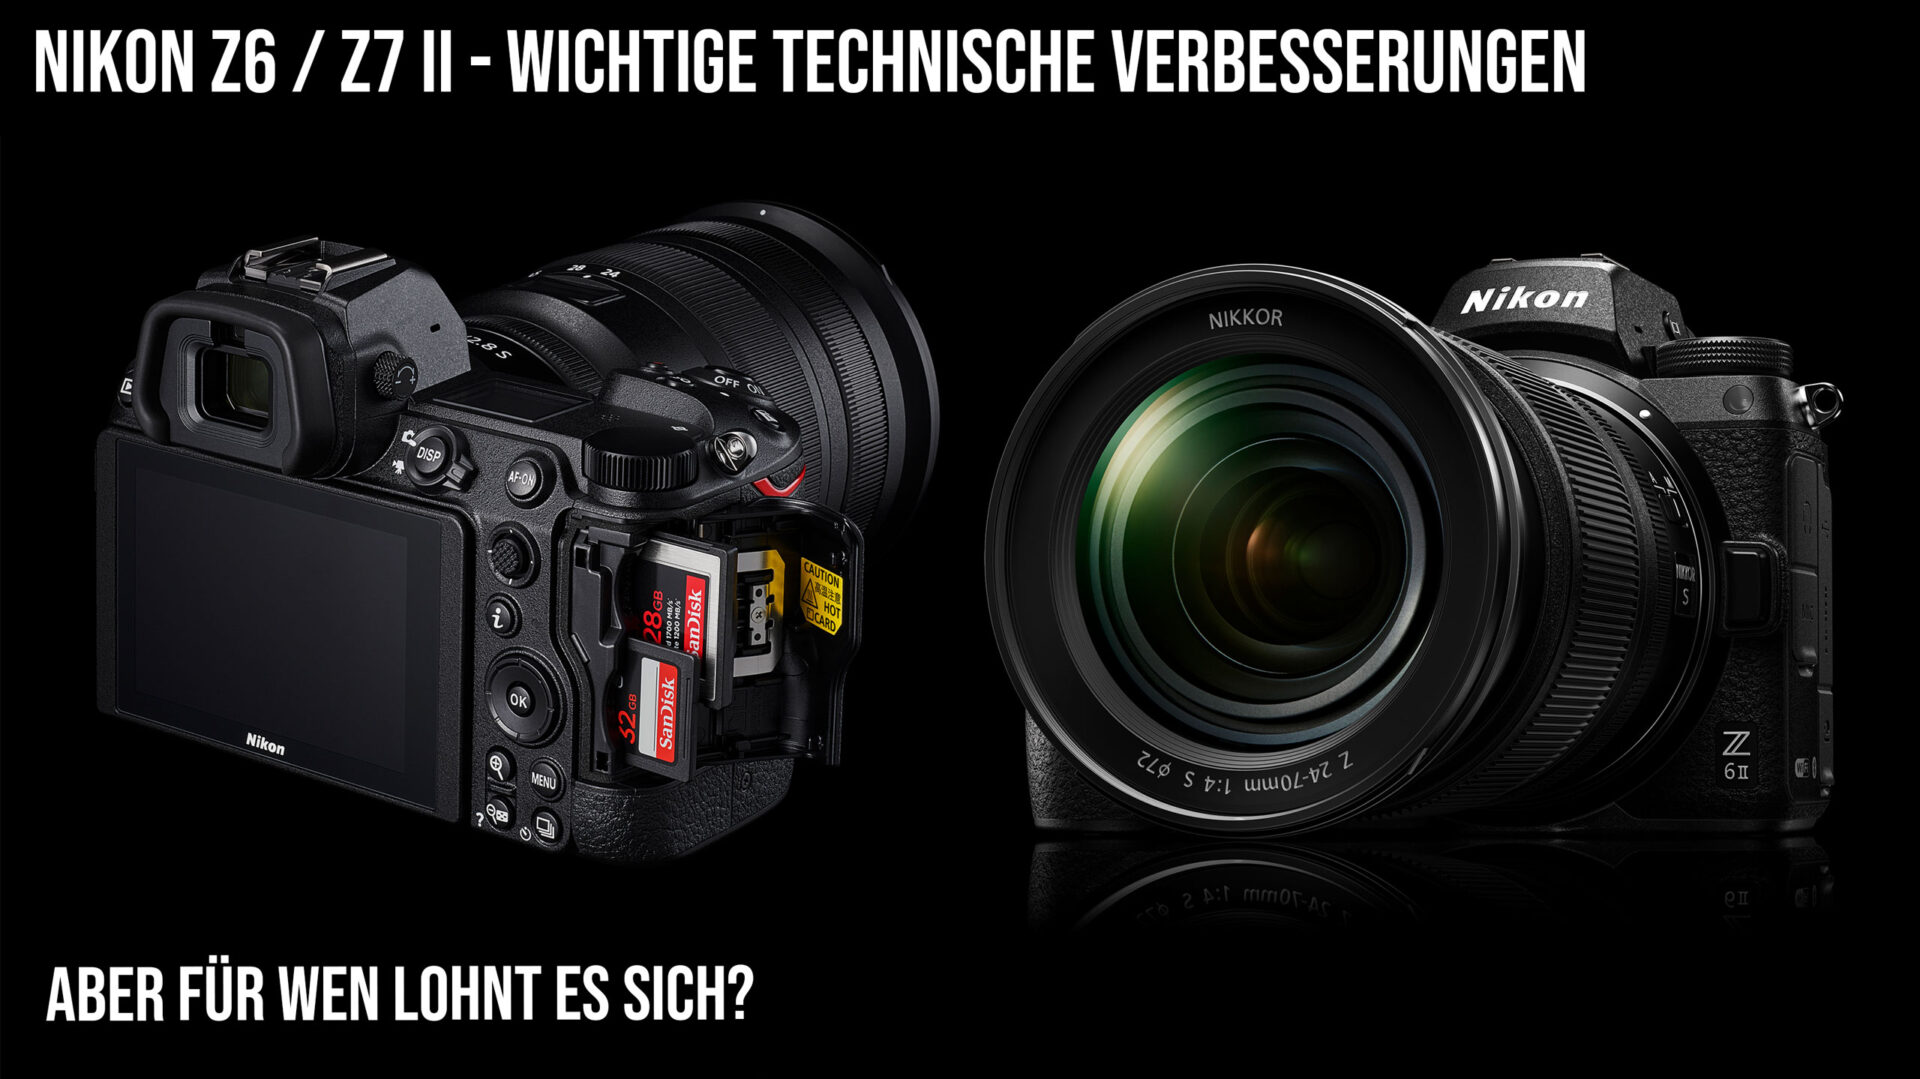 Nikon Z6 II und Z7 II vs Sony A9 A7 vs Canon R5 R6